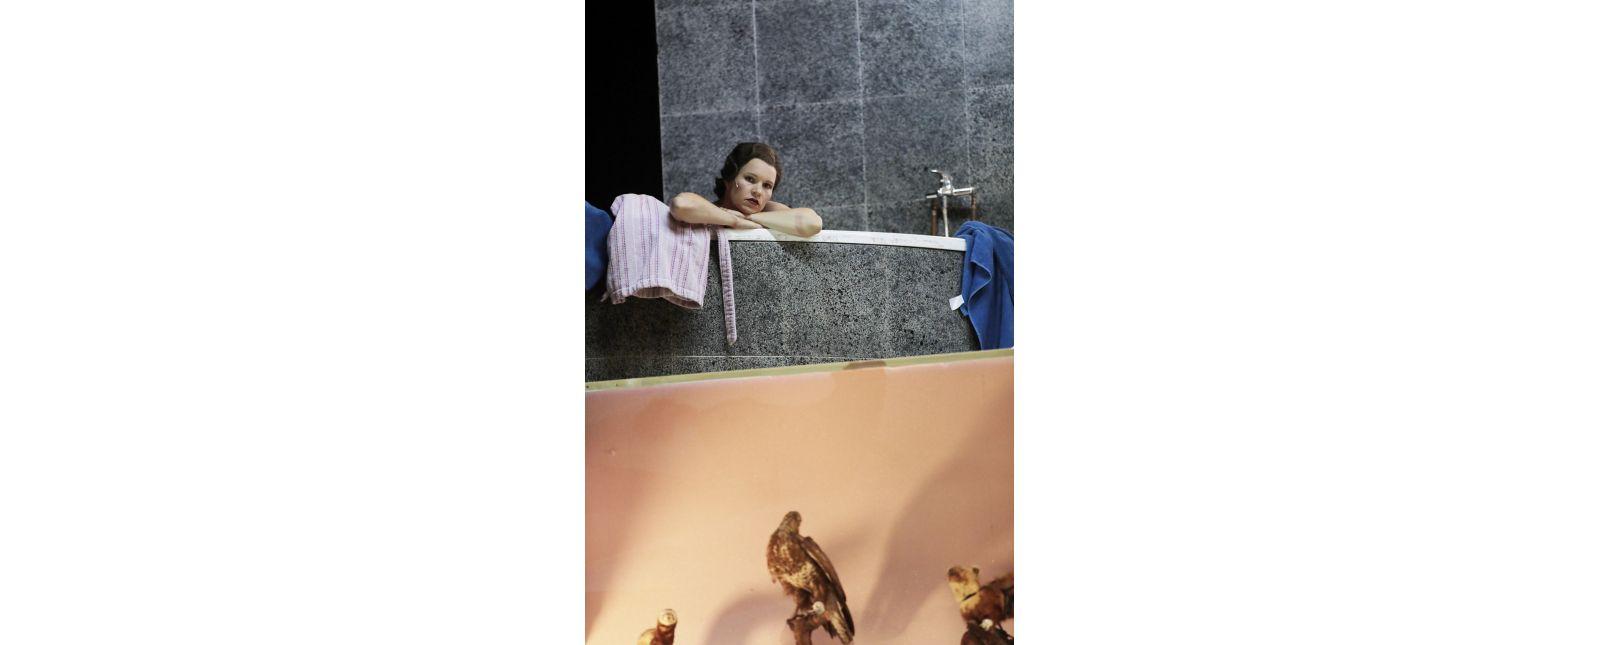 DIE 7 TODSÜNDEN & MOTHERLAND // Inga Schäfer // 2020 // Paul Leclaire